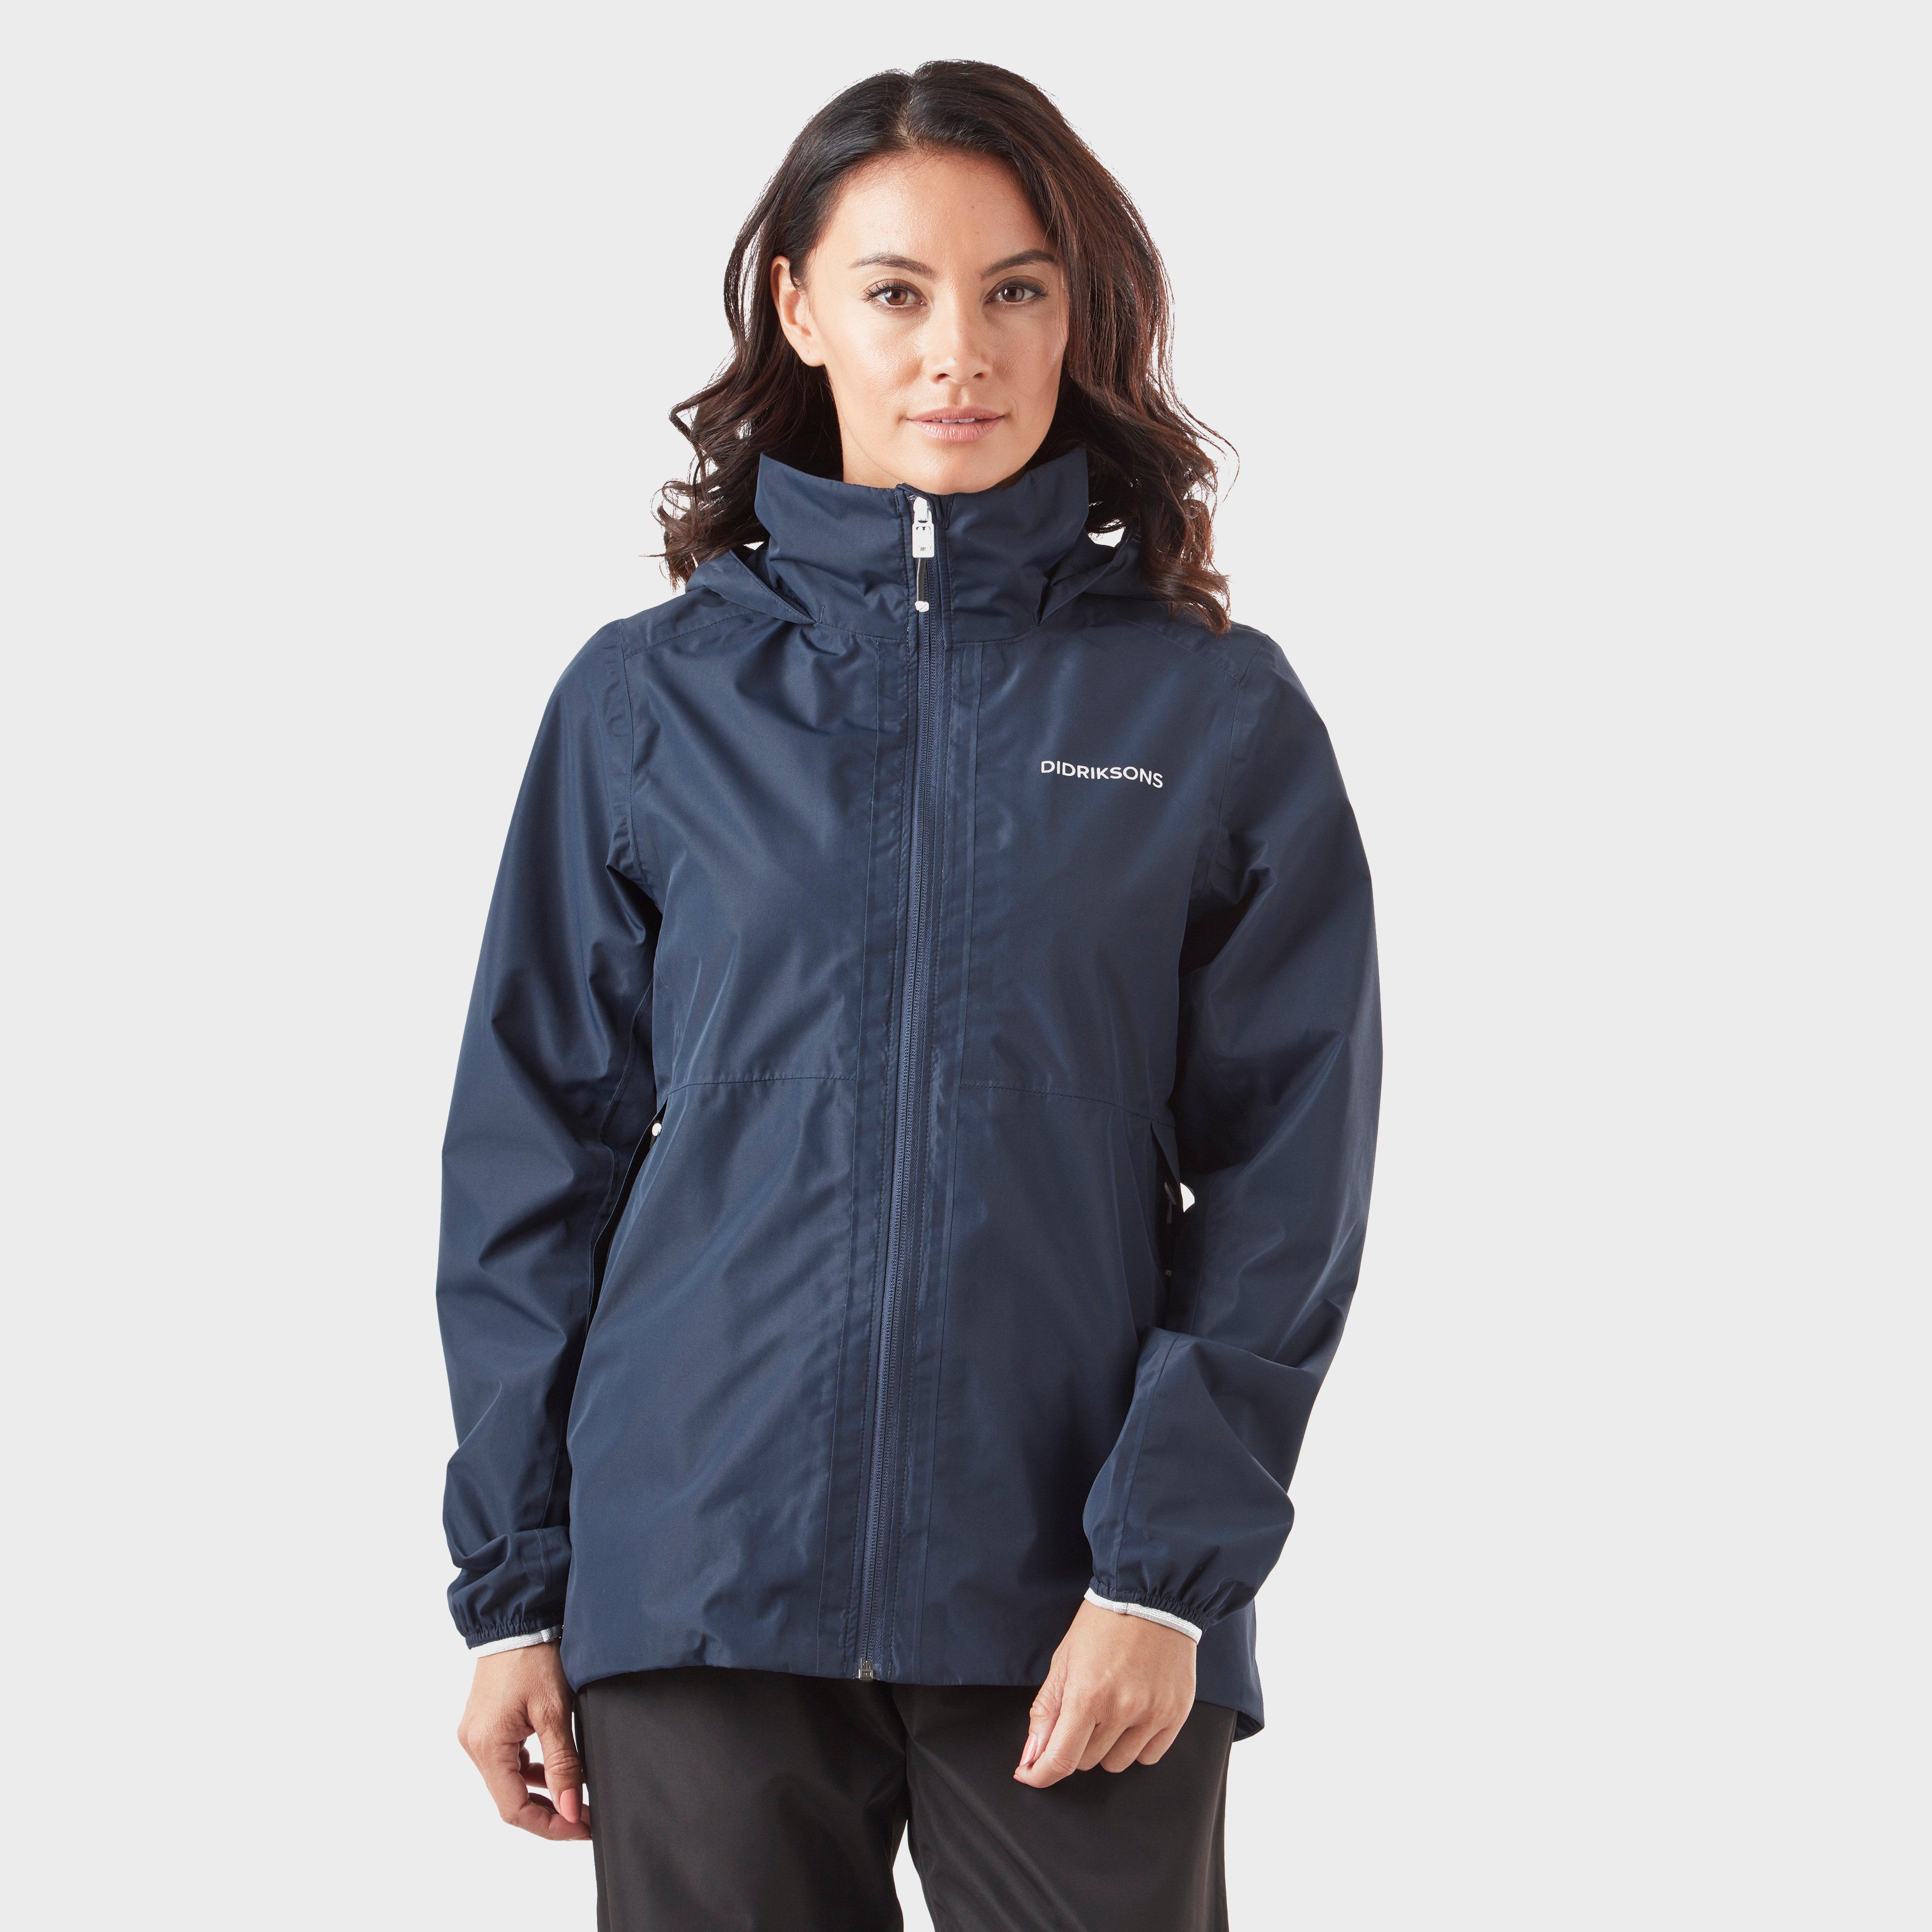 Didriksons Women's Incus Jacket, Navy